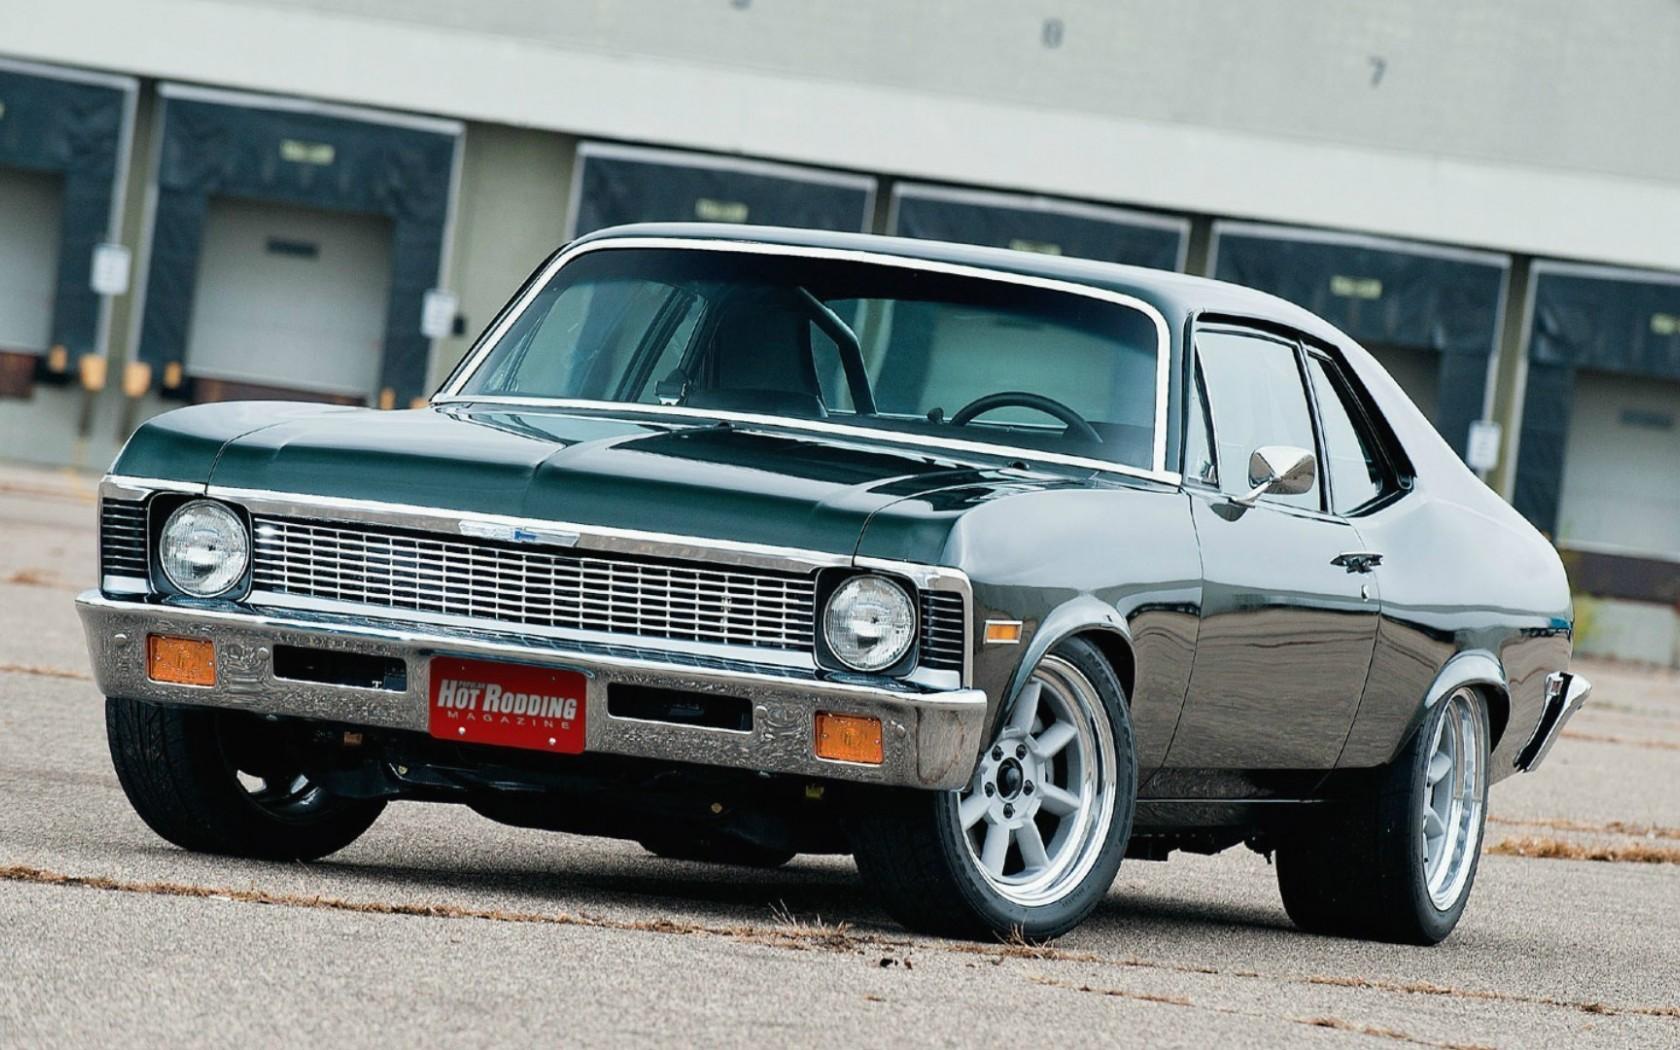 Chevrolet Nova 1970 muscle cars hot rod tuning wallpaper 1680x1050 1680x1050